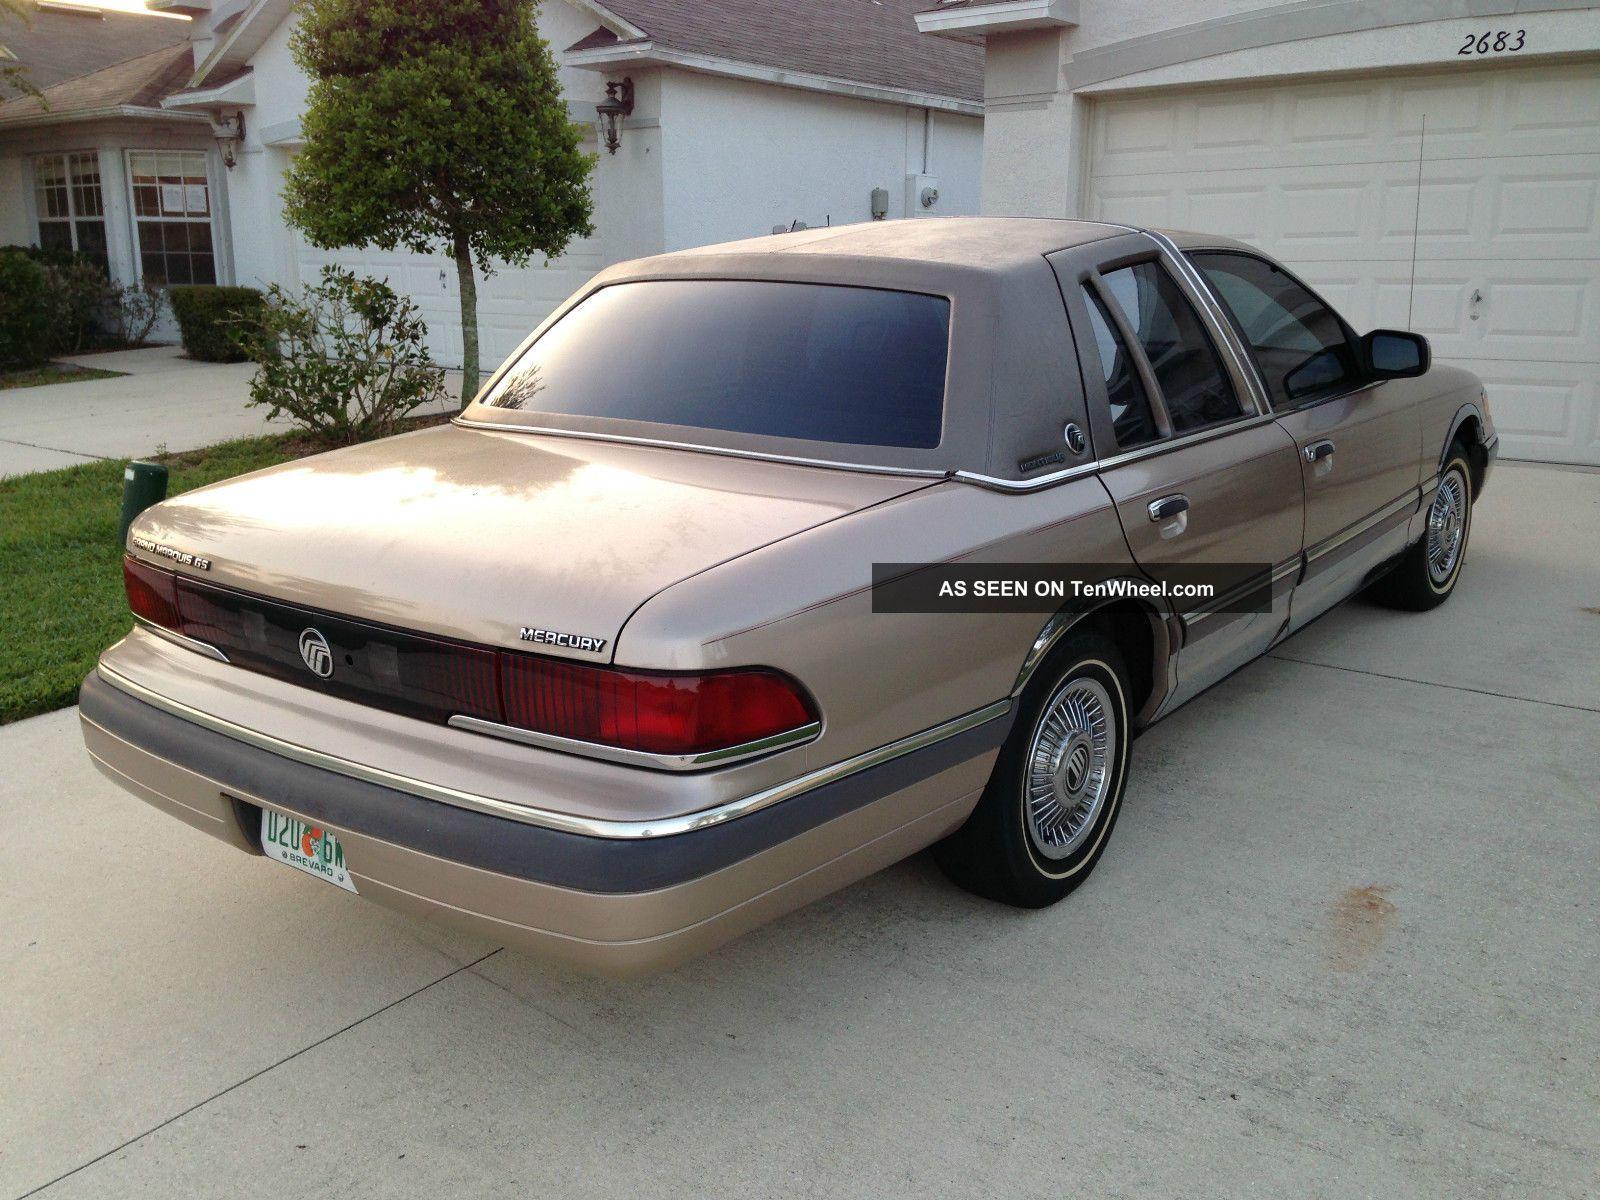 1992 Mercury Grand Marquis Gs Sedan 4